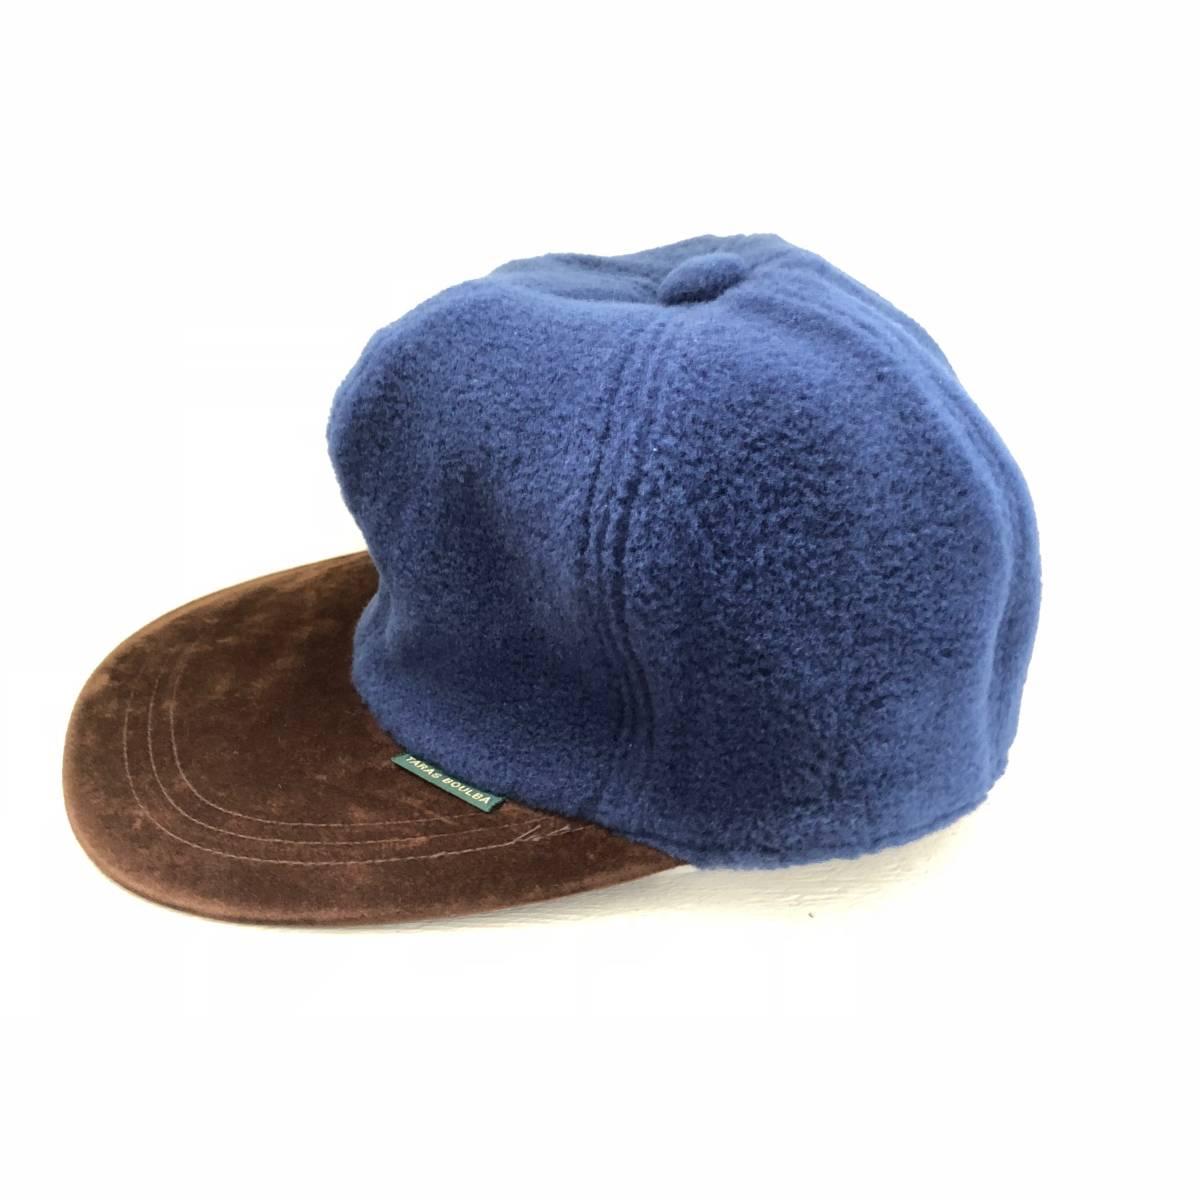 TARAS BOULBA タラスブルバ 帽子 キャップ フリースカントリーキャップ ネイビー 青系 L メンズ アシックス asics UFH350 日本製 未使用_画像2